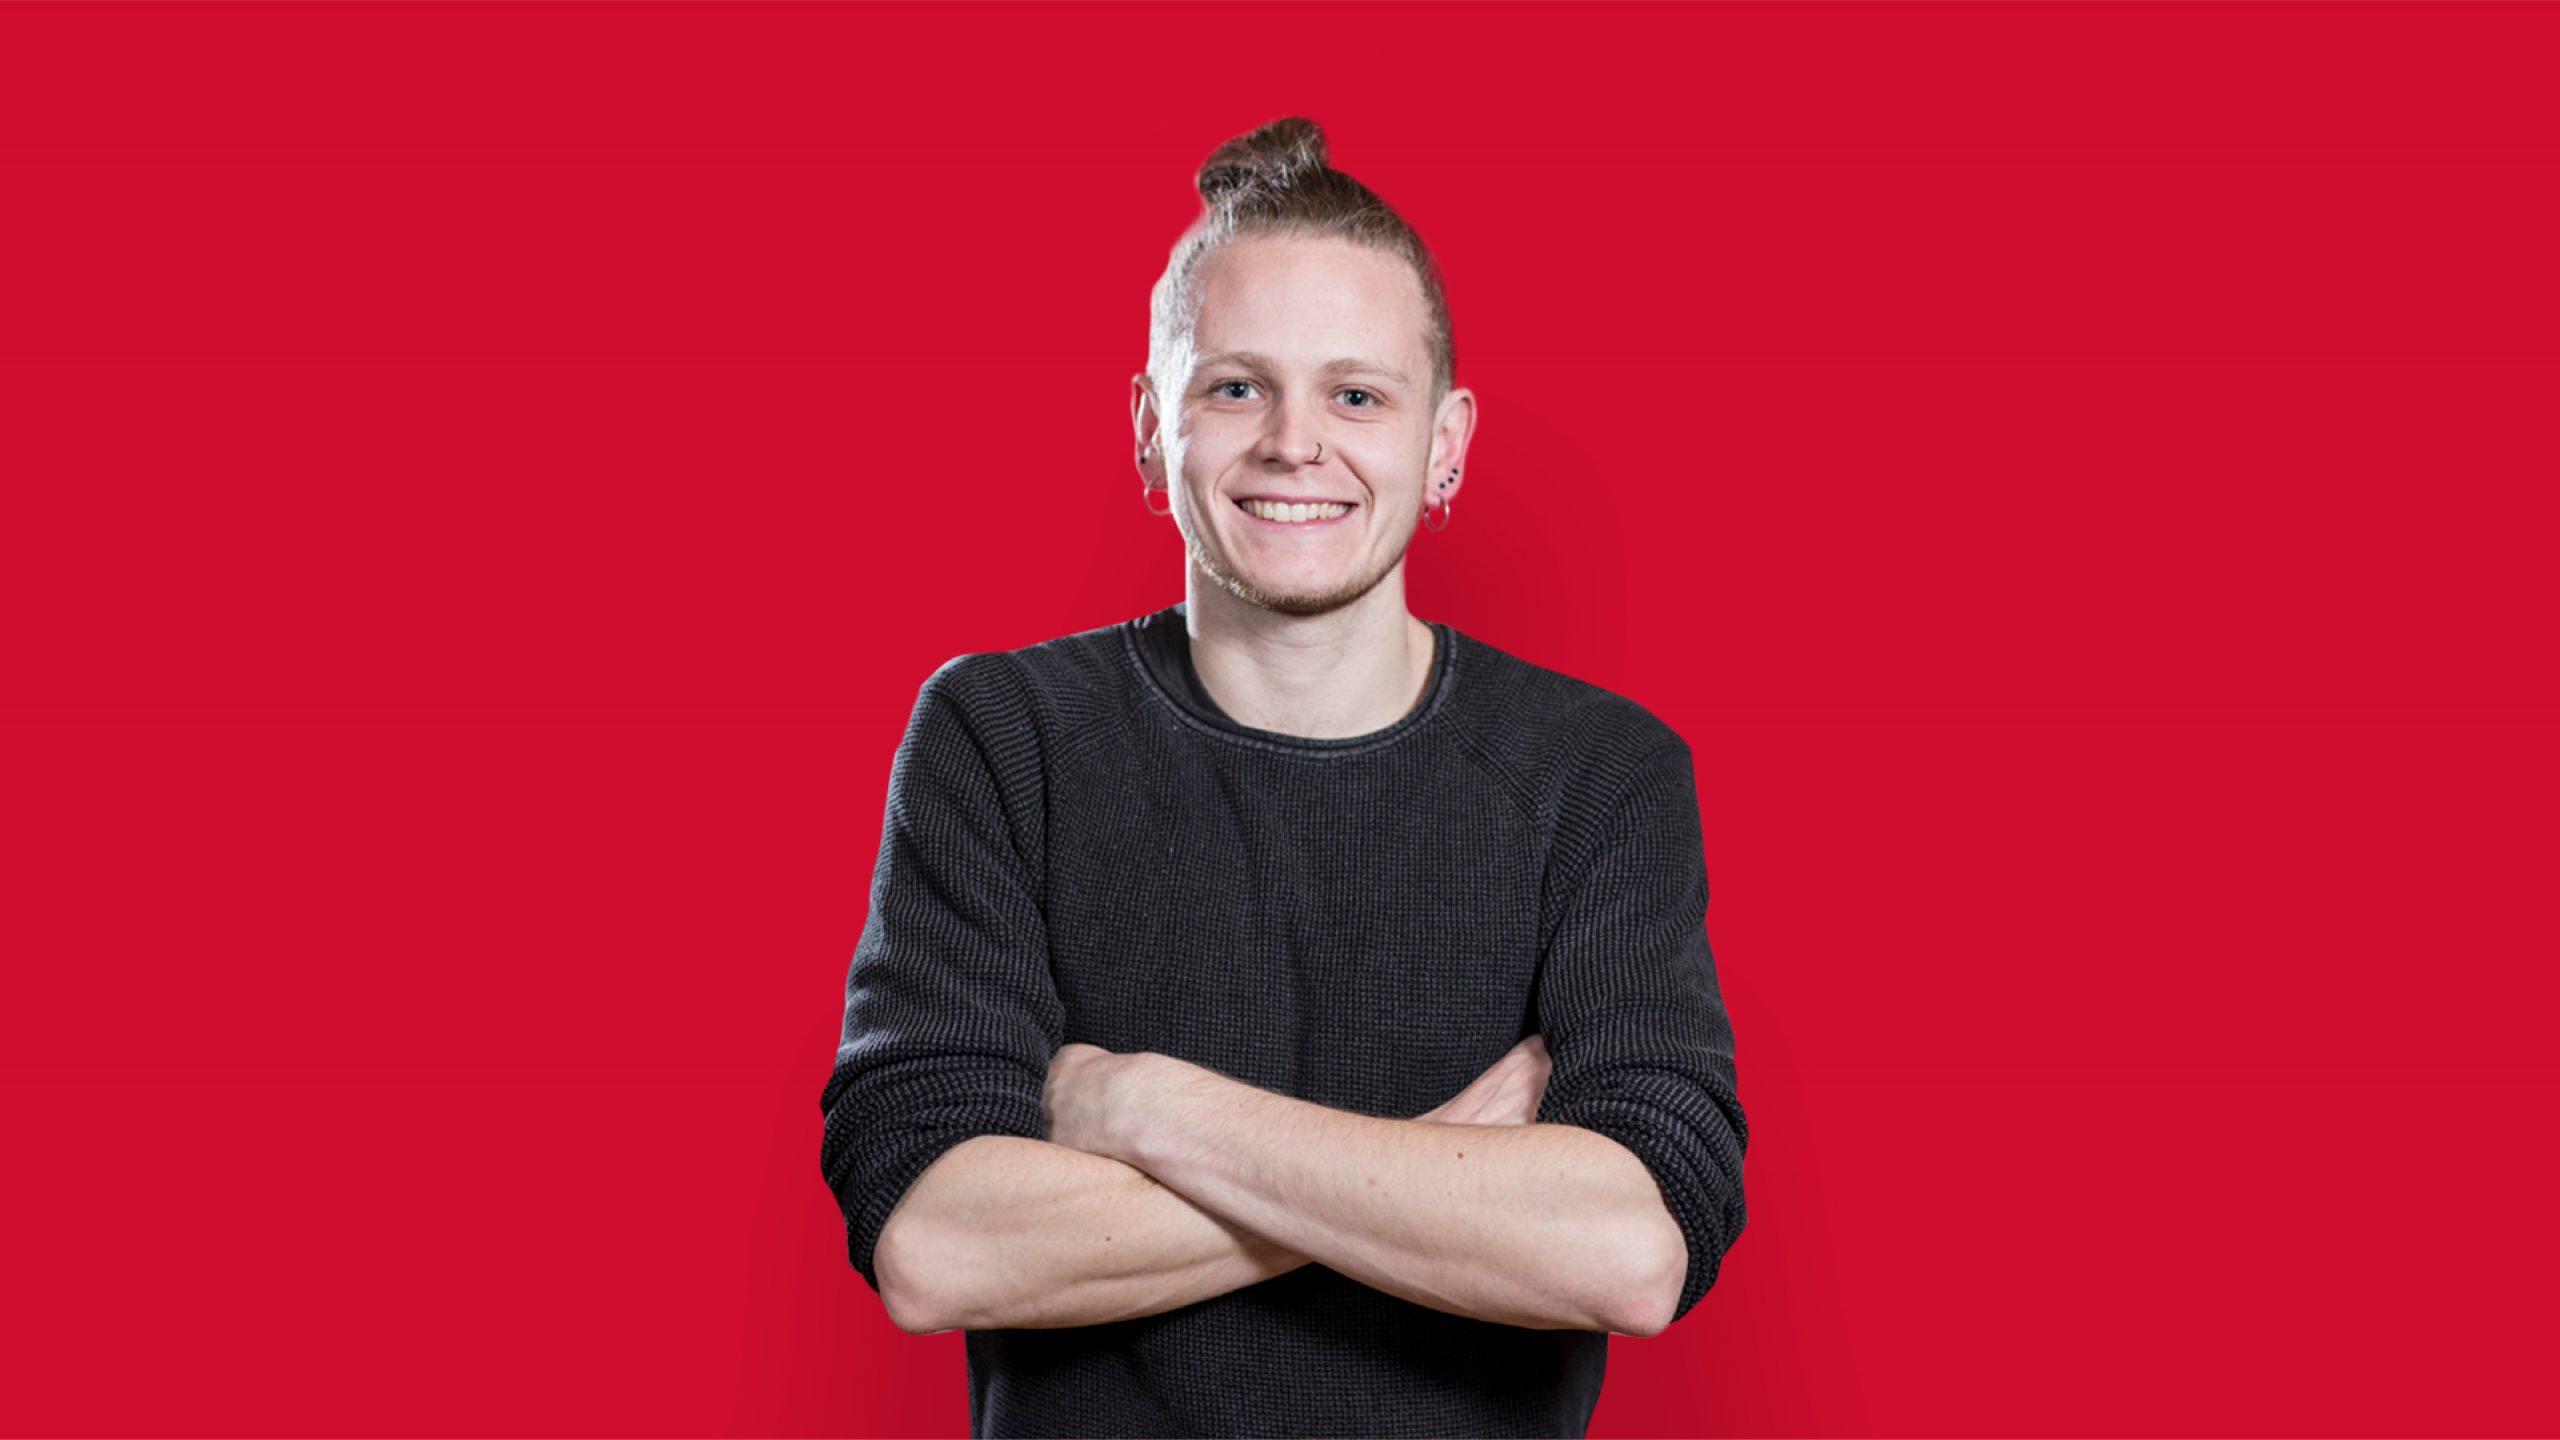 Corey Squarzoni